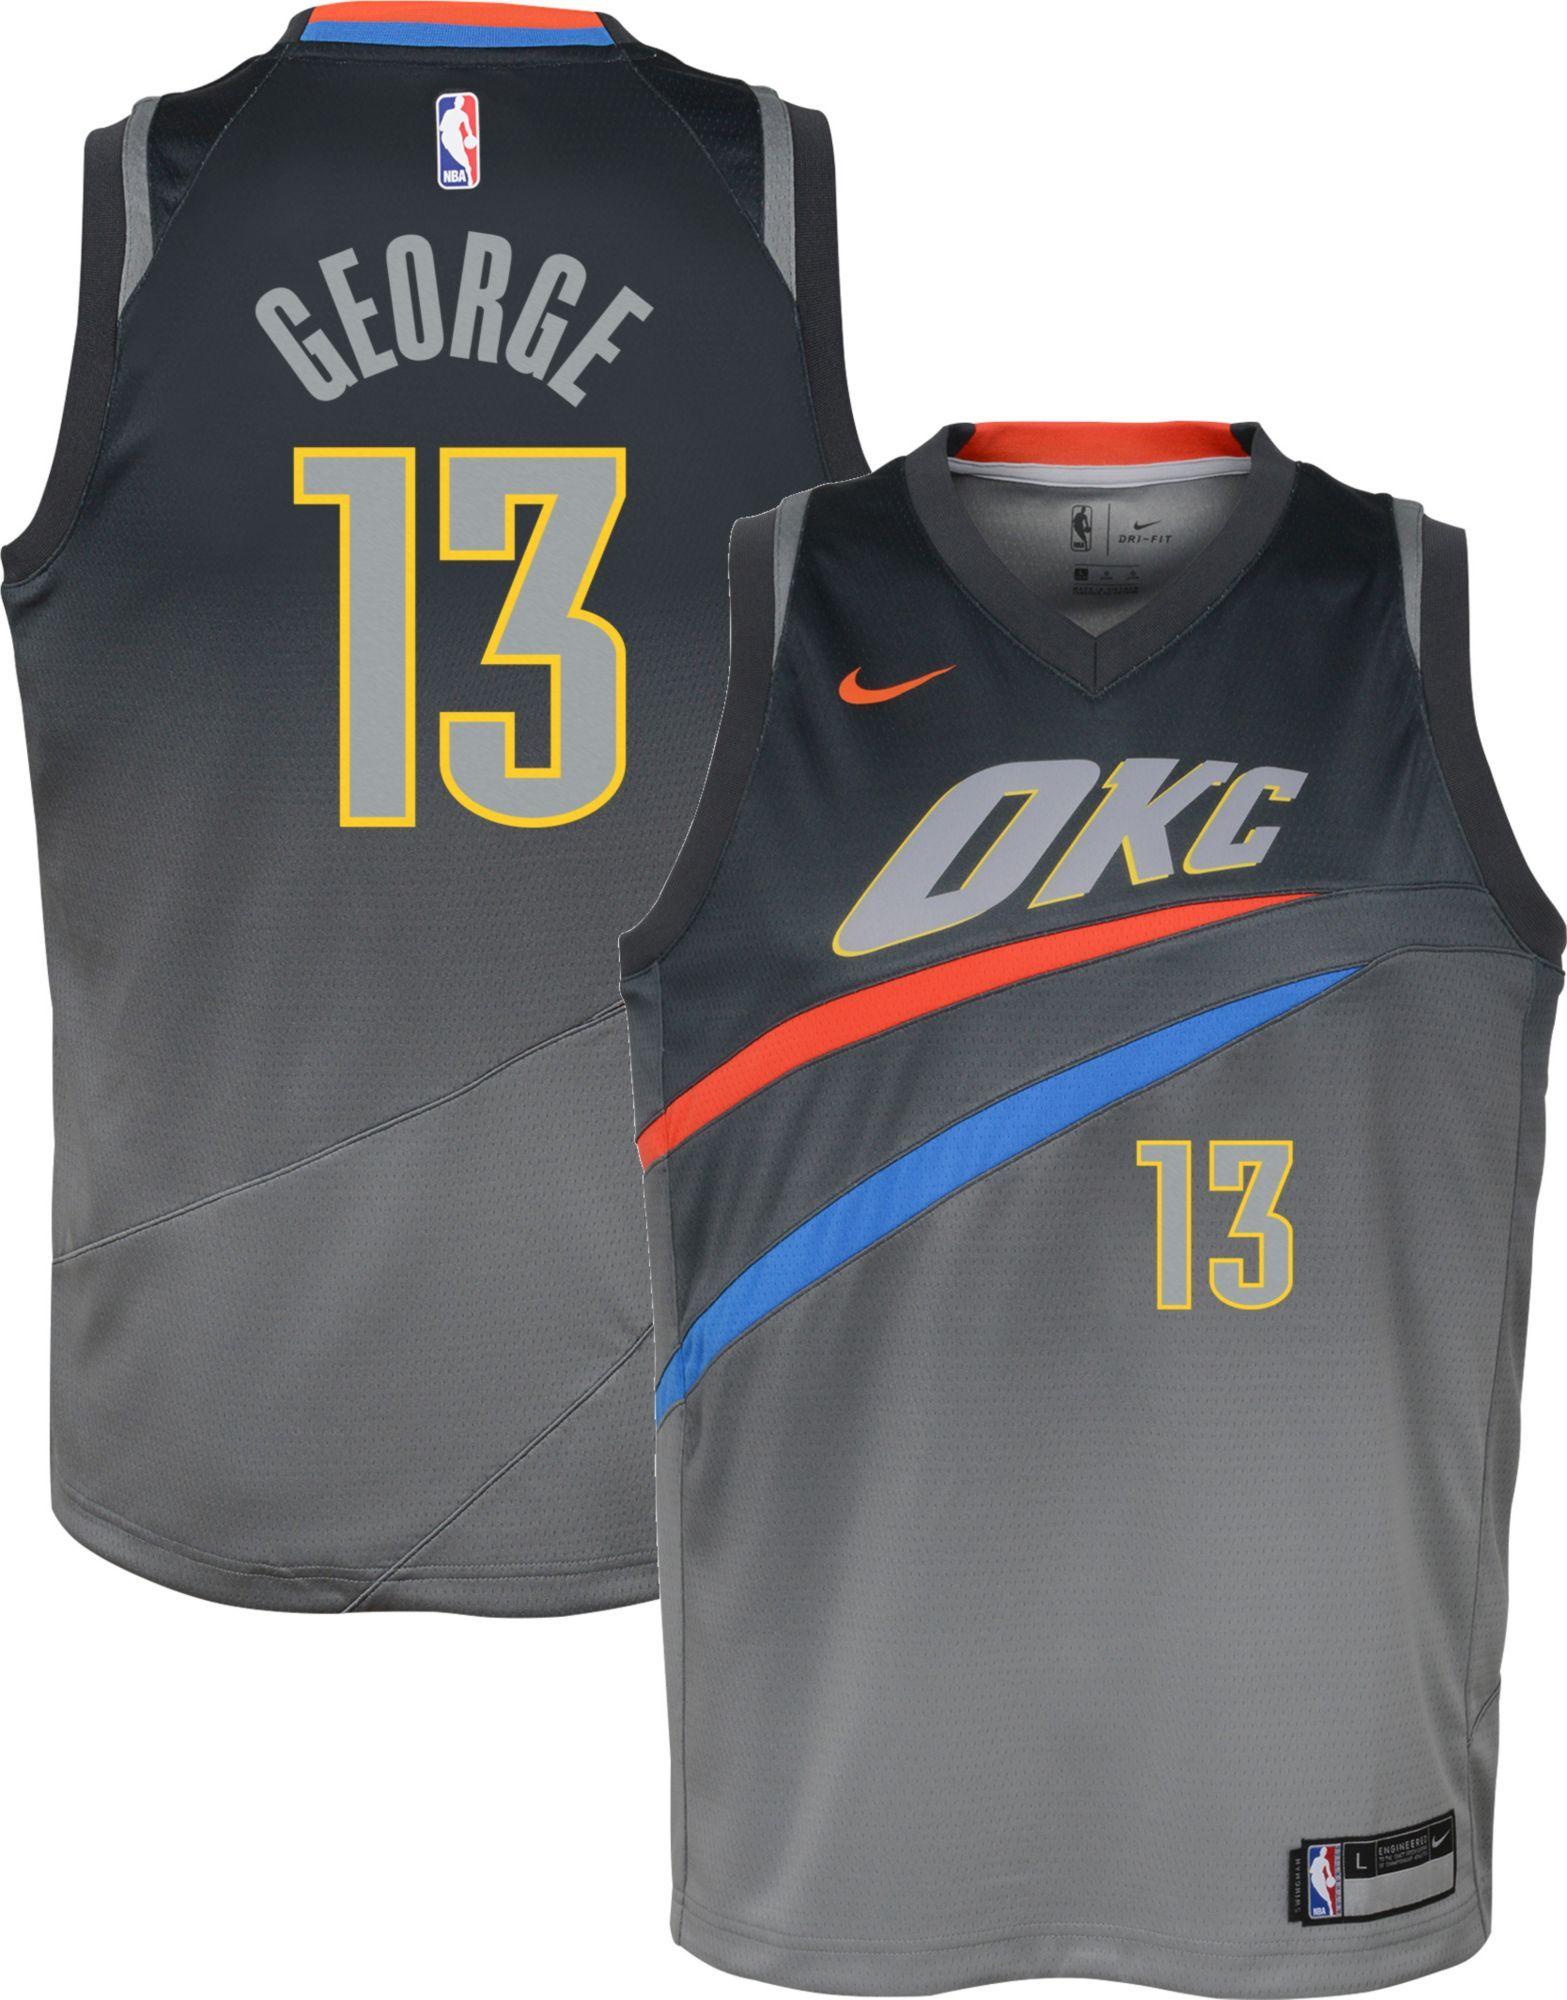 a4119d120c9 Nike Youth Oklahoma City Thunder Paul George Dri-FIT City Edition Swingman  Jersey, Size: Large, Multi